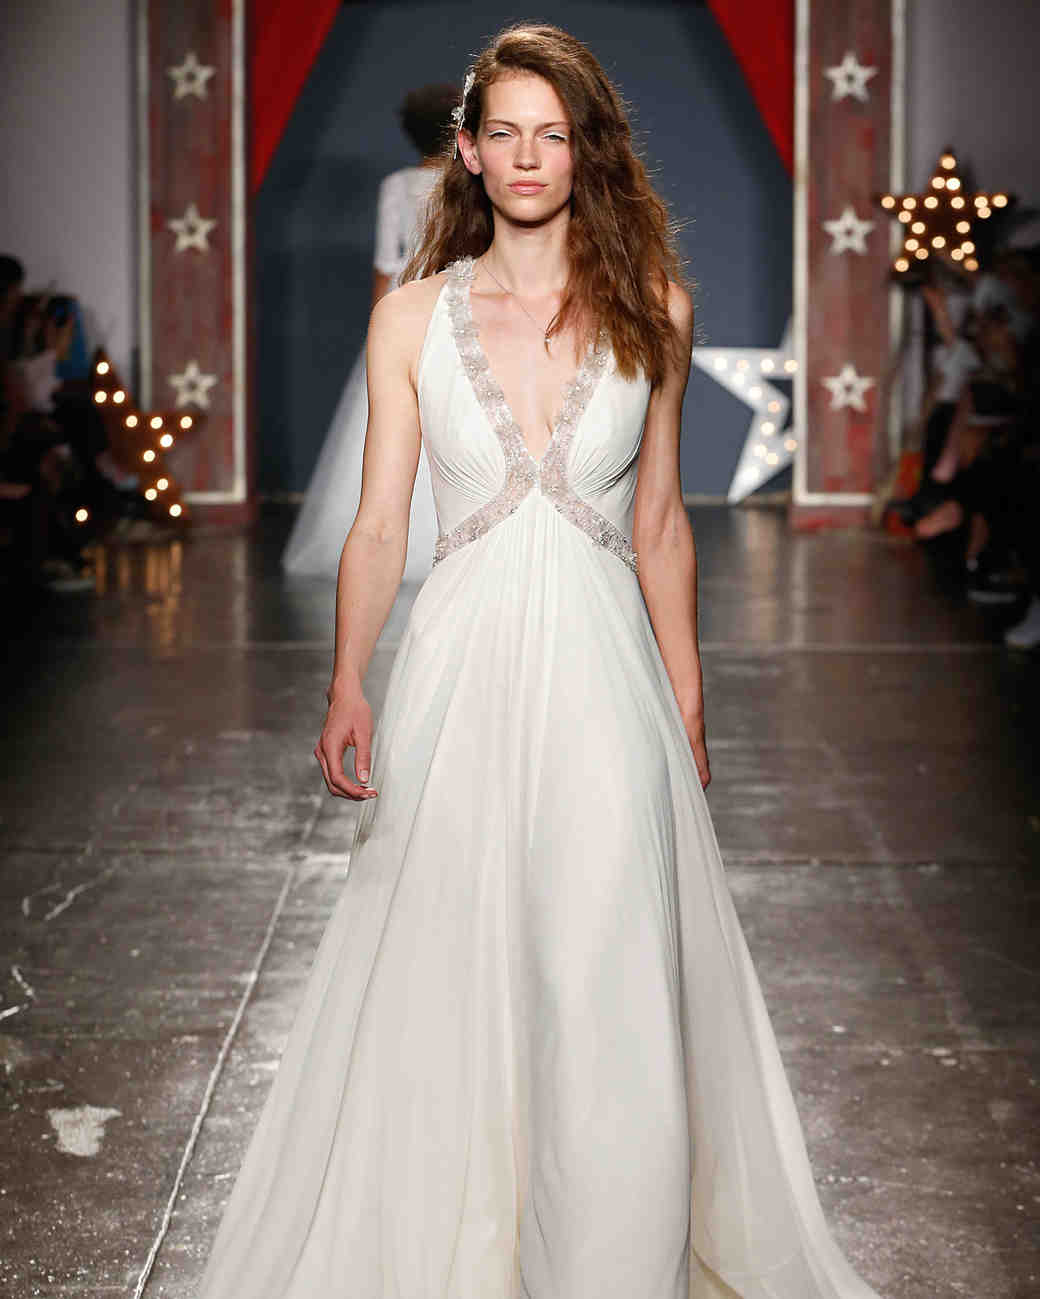 jenny packham wedding dress spring 2018 plunging embroidered neck